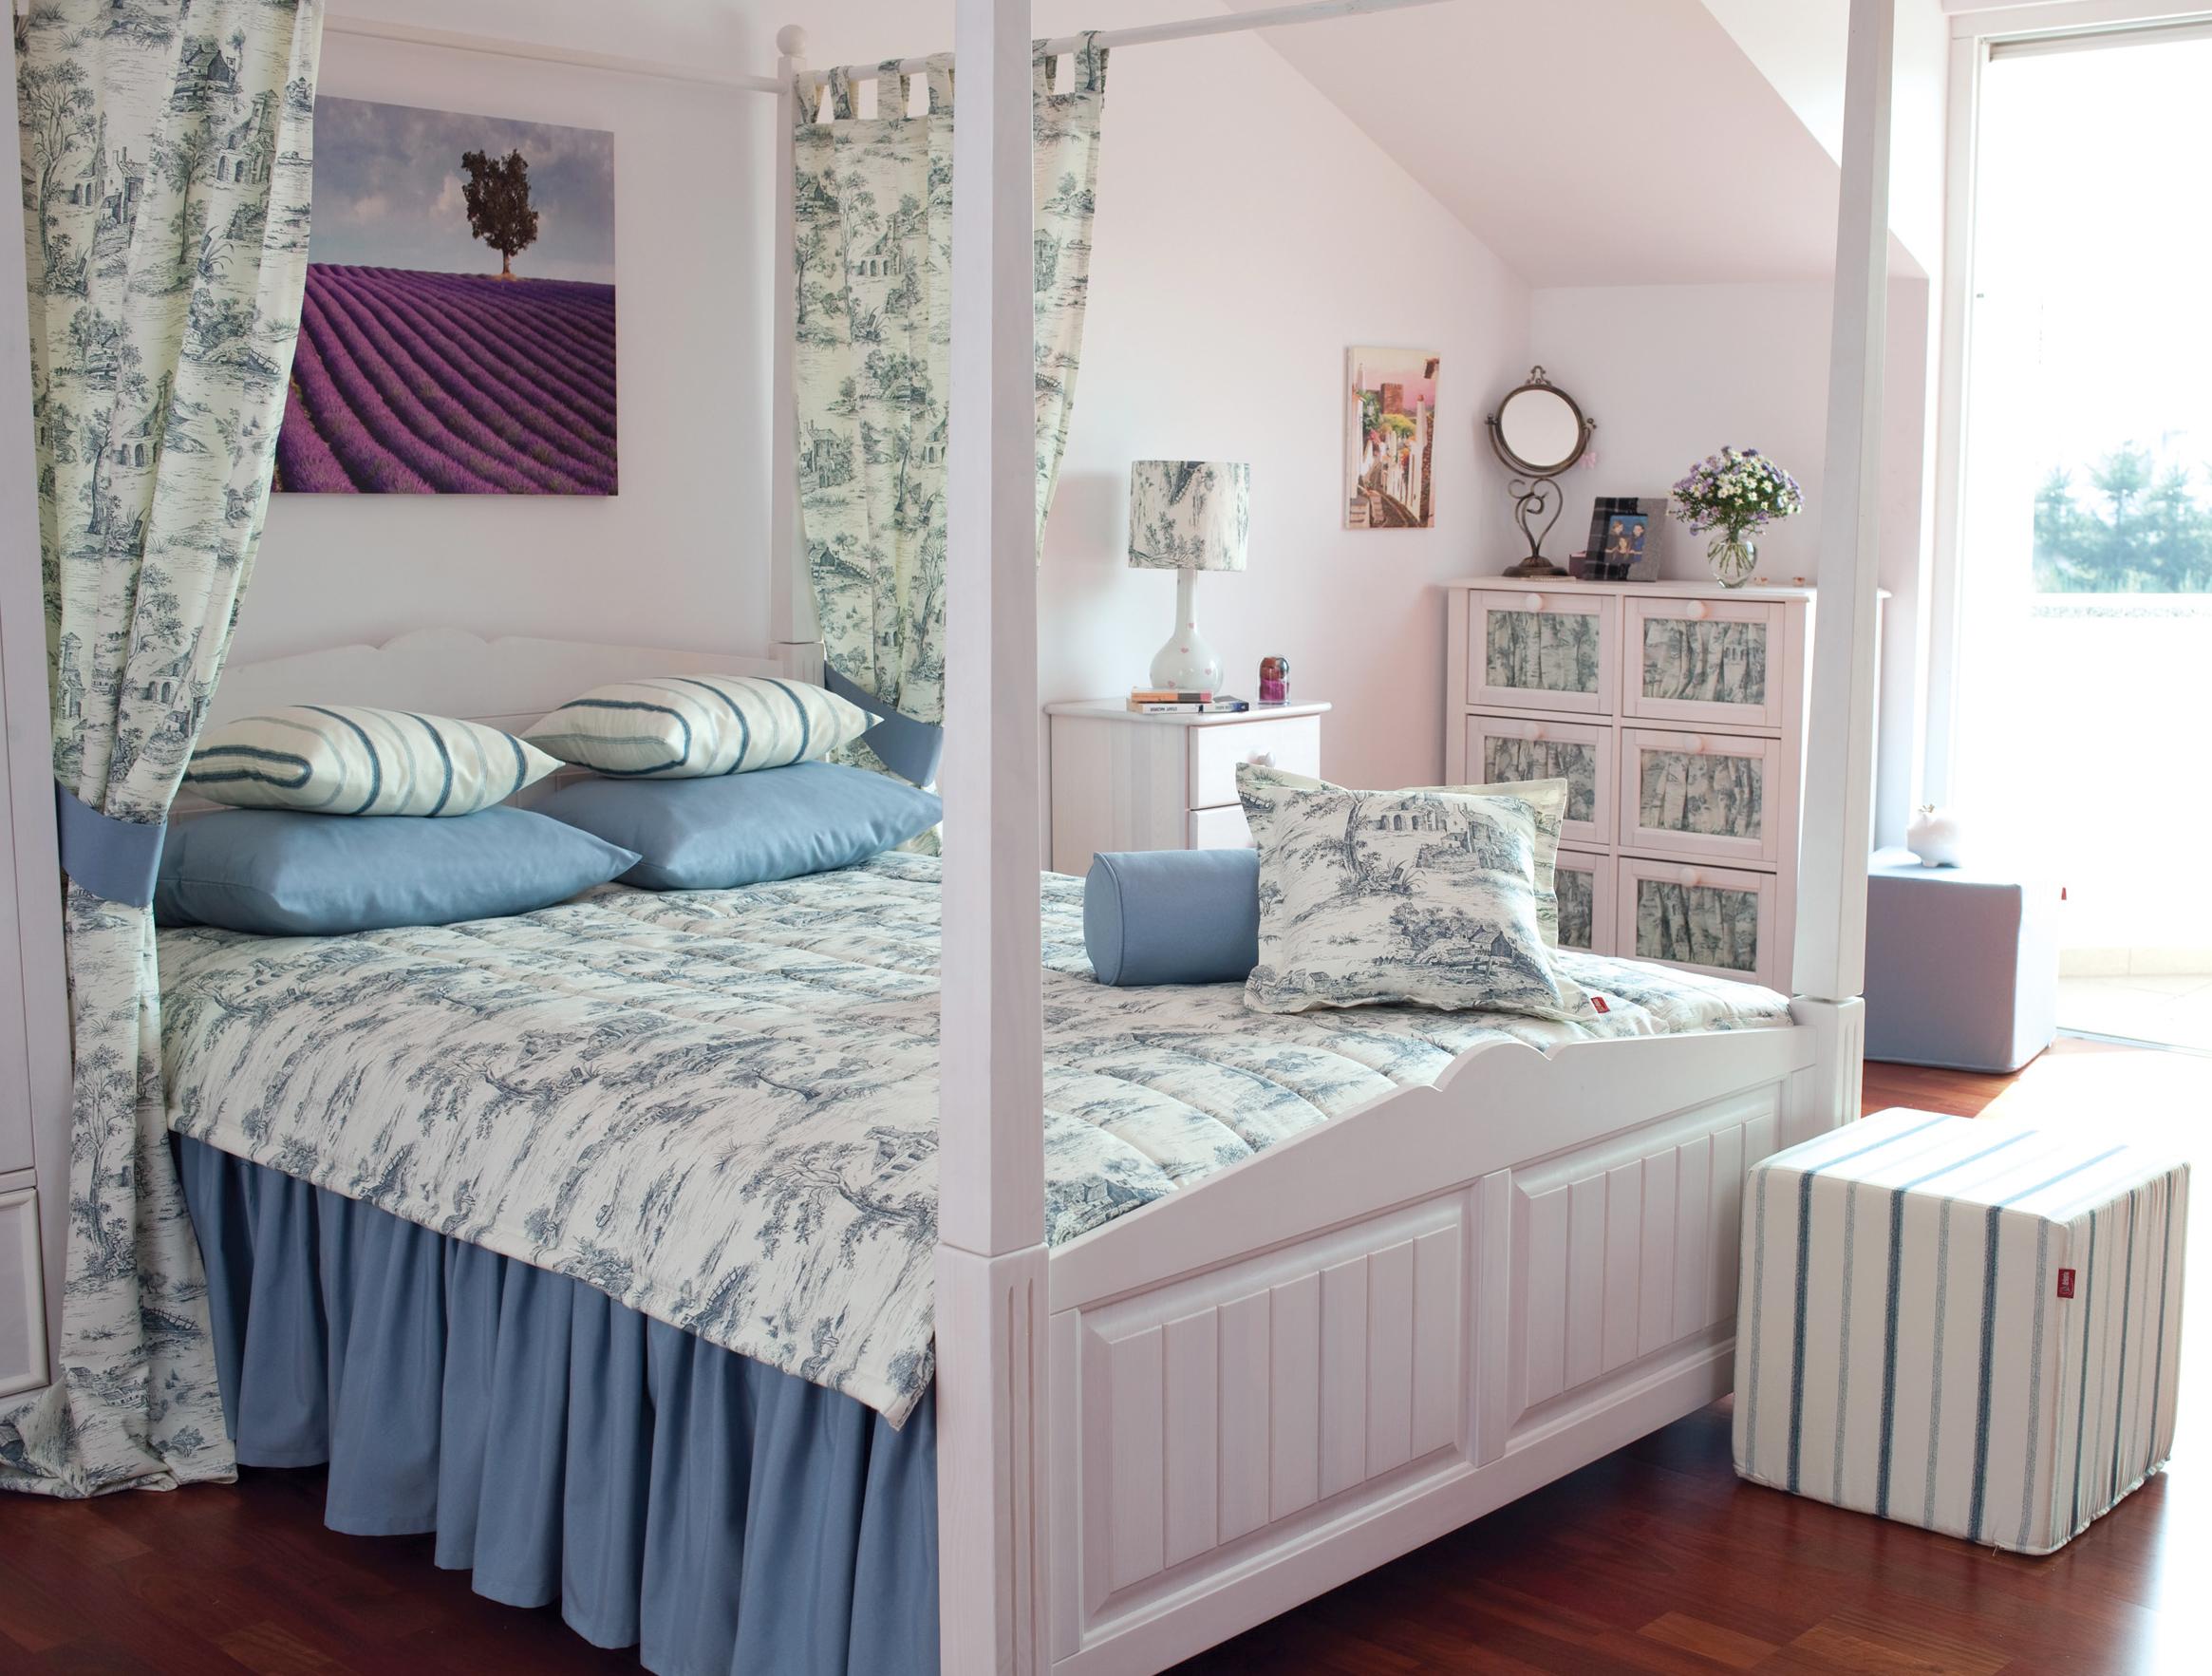 Schlafzimmer im Shabby Chic